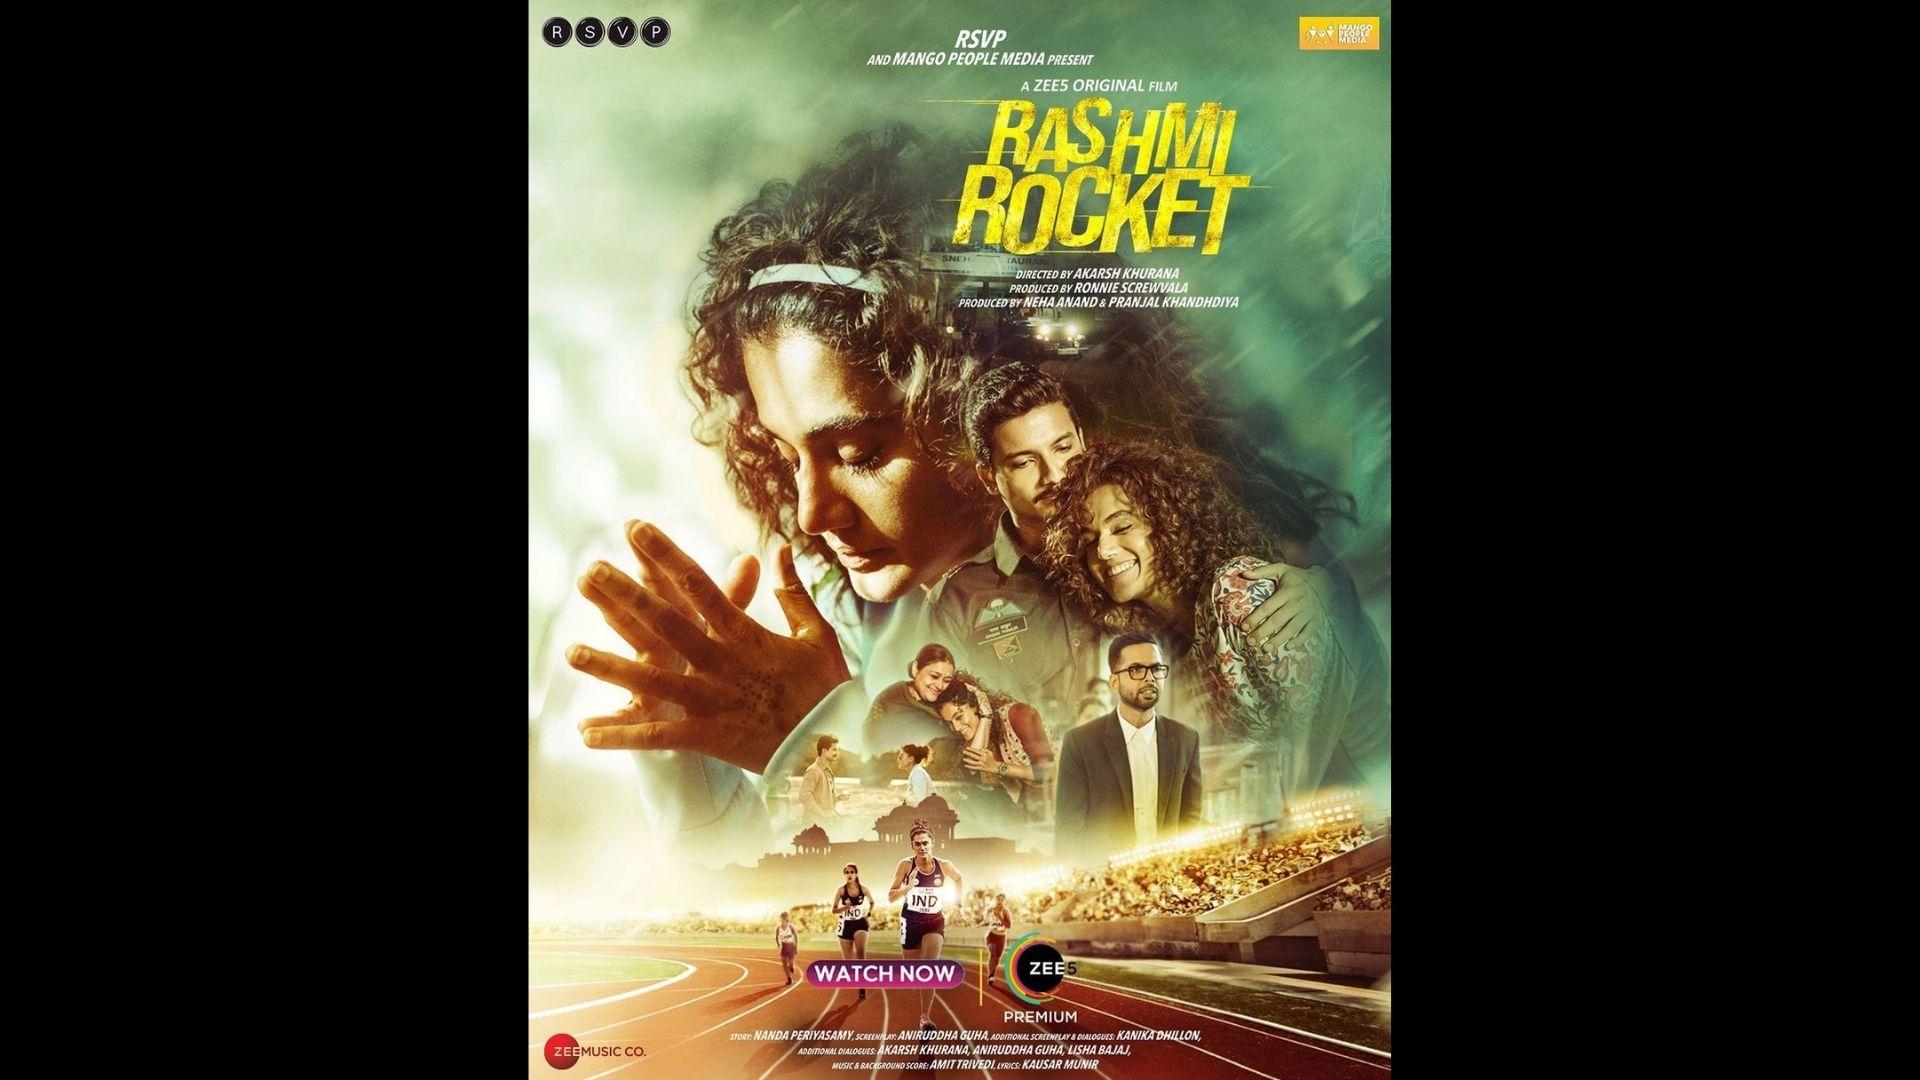 Rashmi Rocket Netizens Review: Taapsee Pannu Starrer Garners Praises; Fans Say, 'Sensible Topics Raised' In The Sports Drama